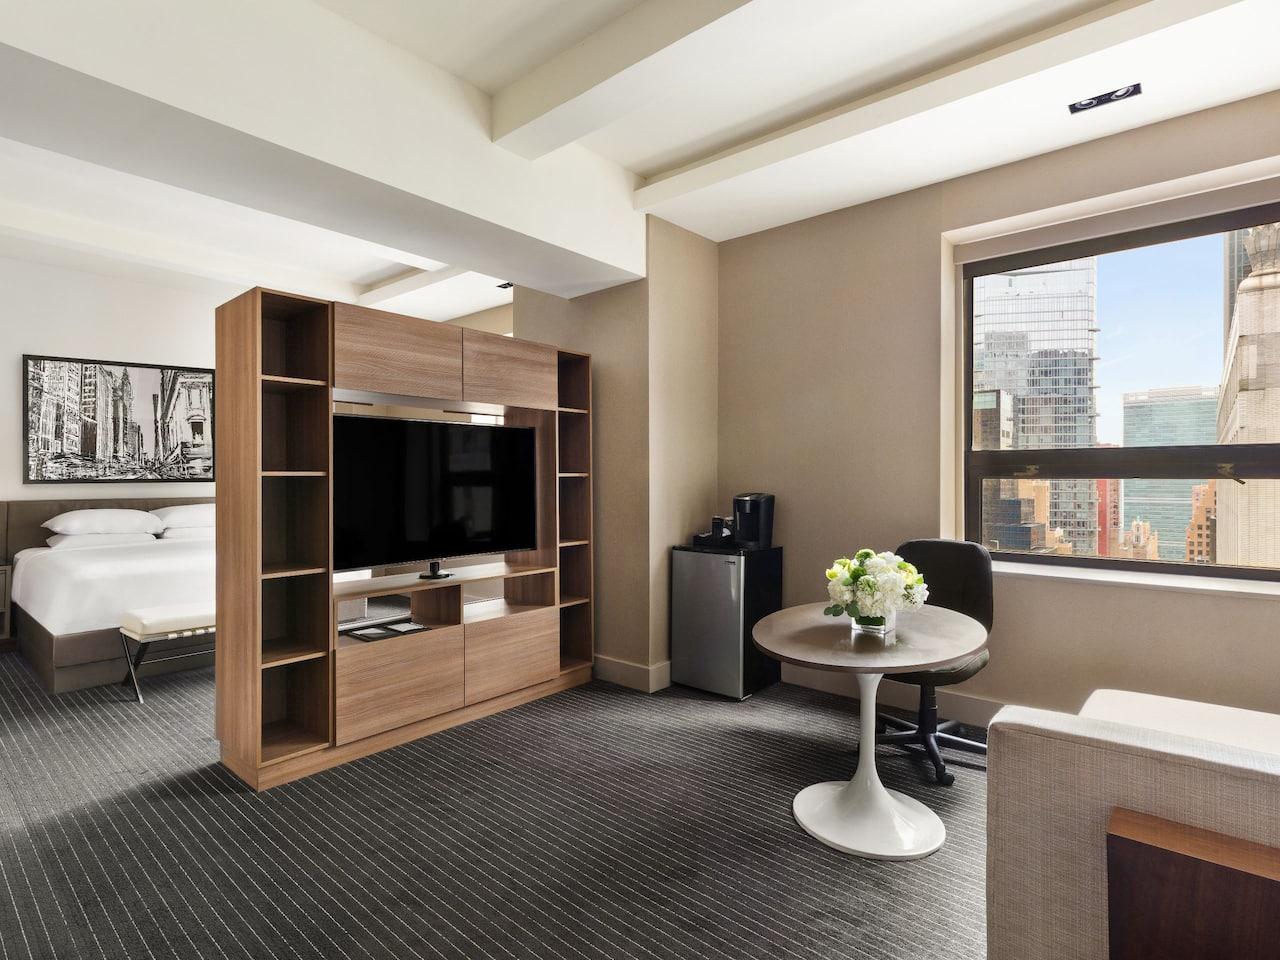 Grand Hyatt New York King Suite with City View